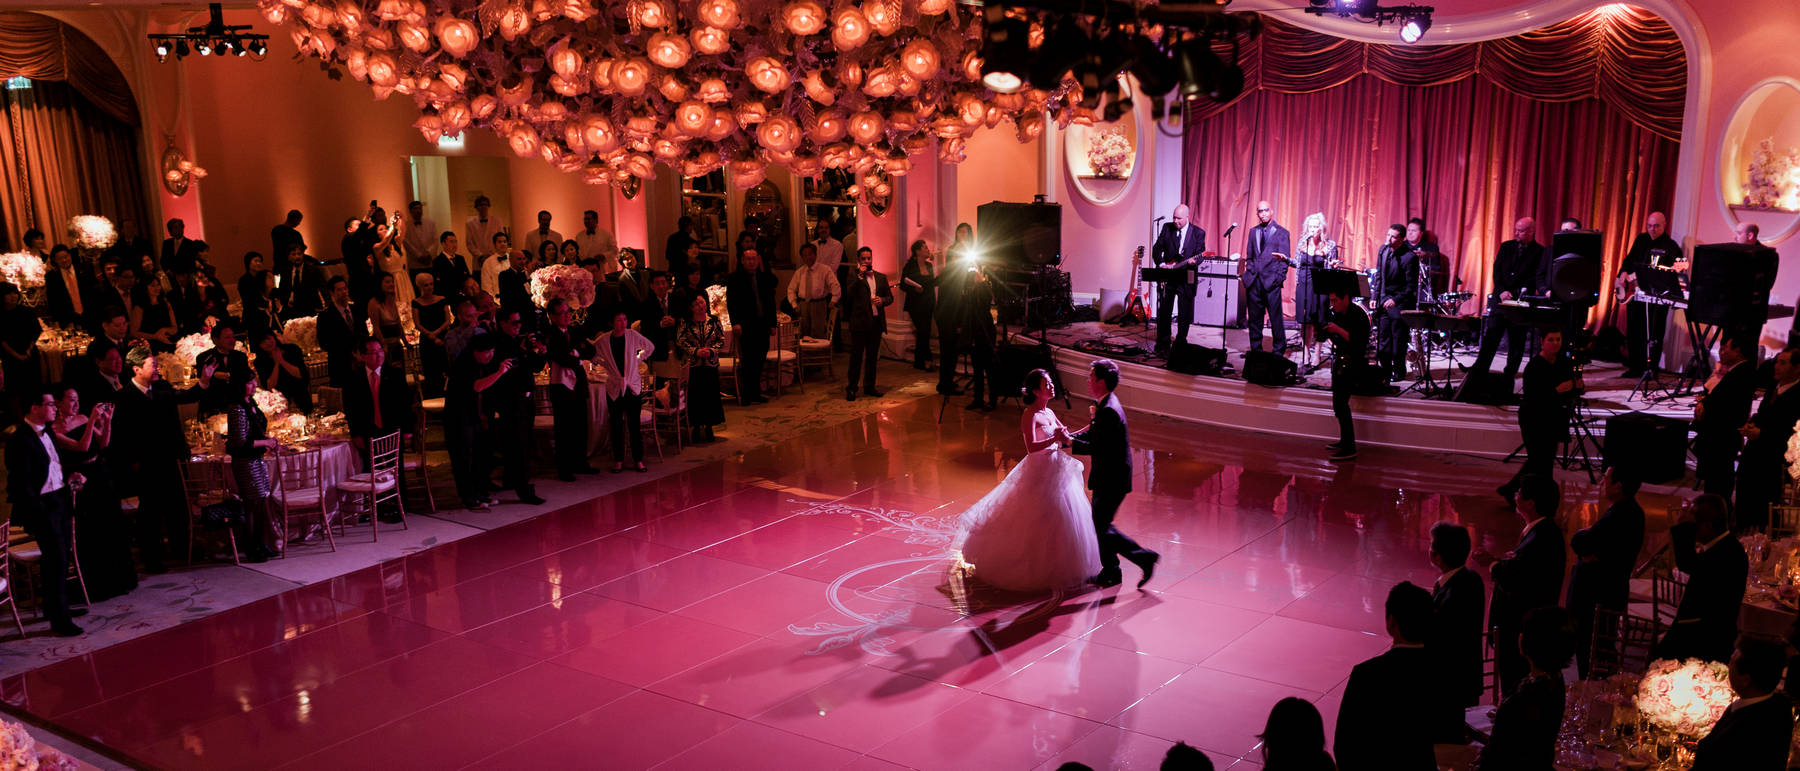 johnandjoseph-wedding-photographer-hz-slider-291